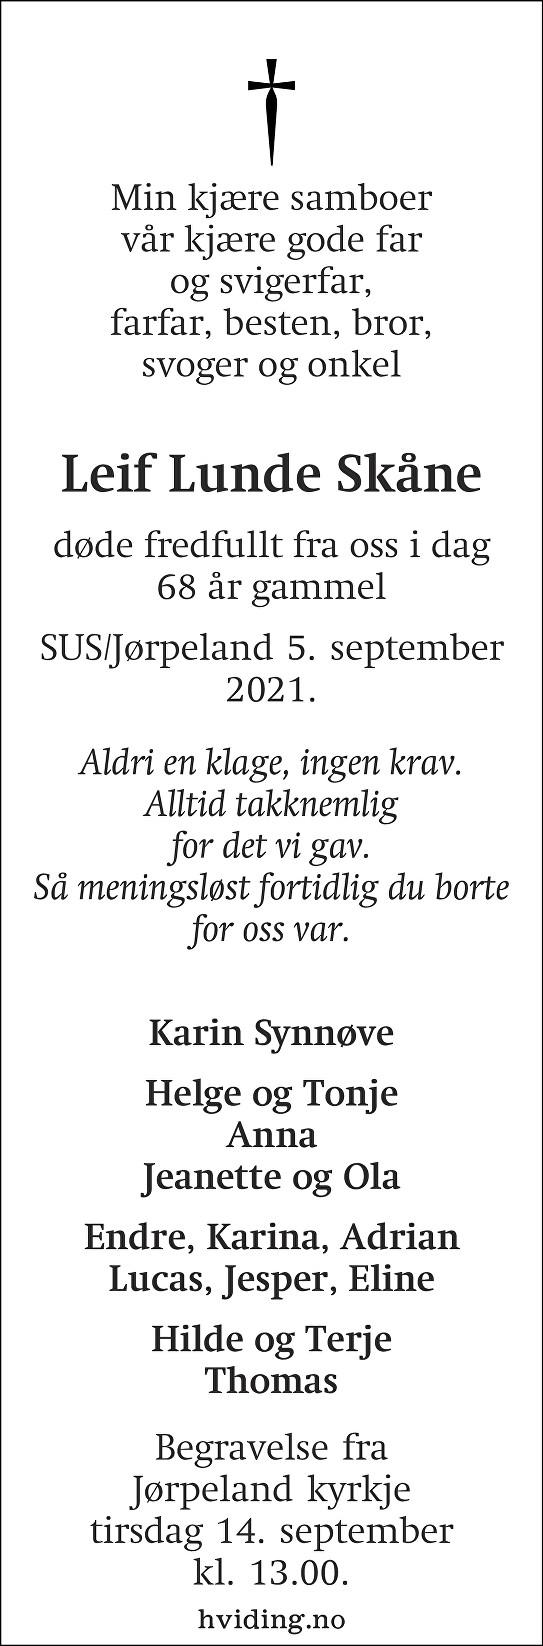 Leiv Lunde Skåne Dødsannonse